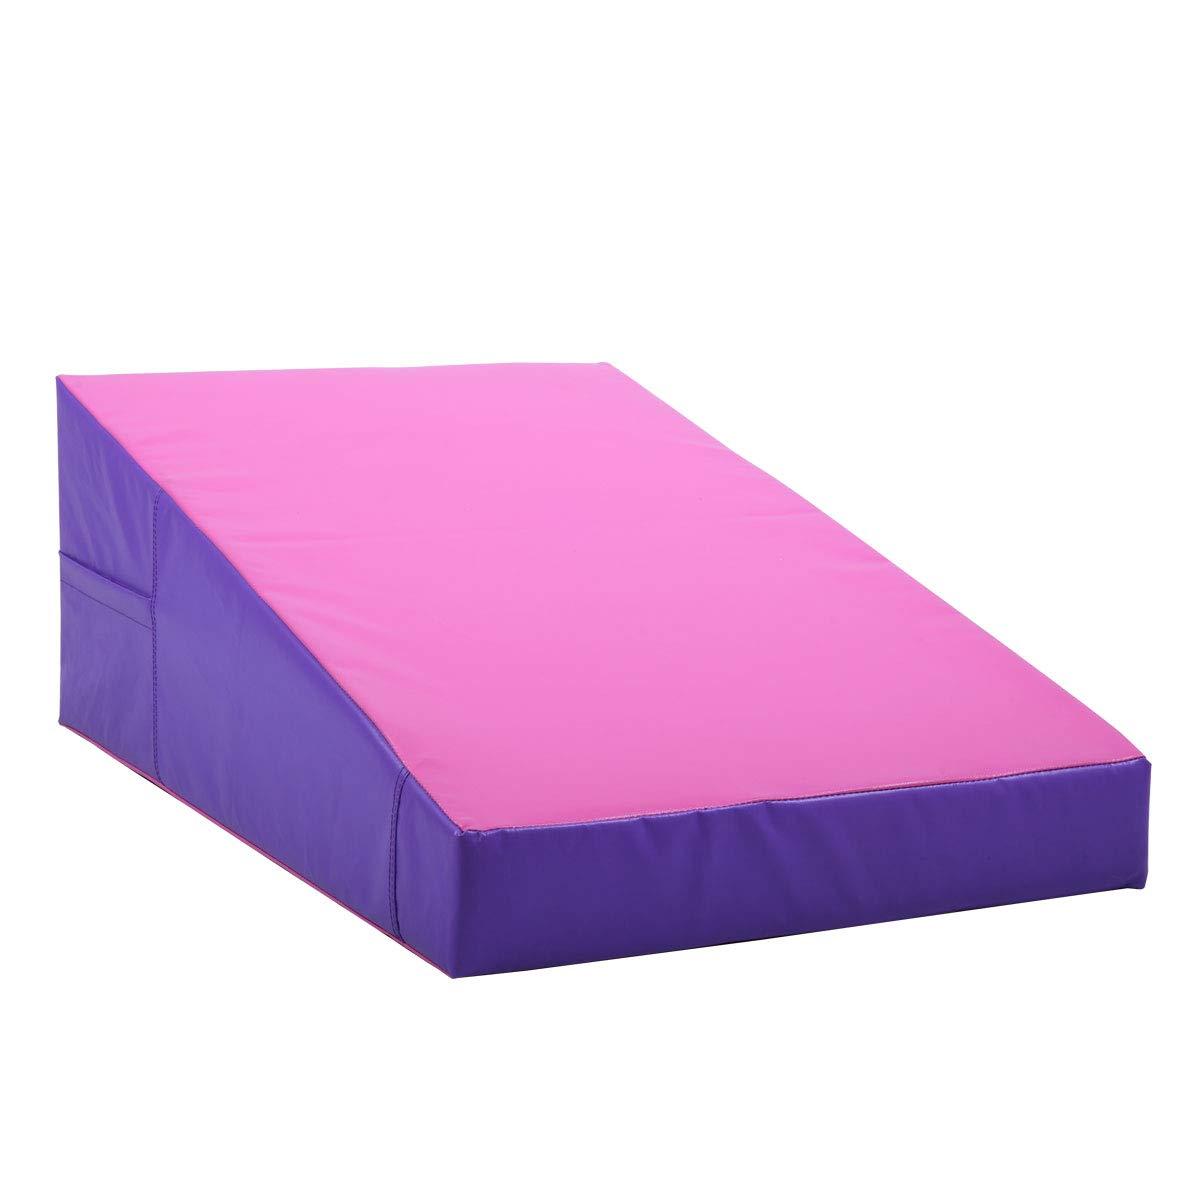 JAXPETY Gym Gymnastics Incline Mat Slope Cheese Exercise Aerobics Tumbling Fitness Wedge